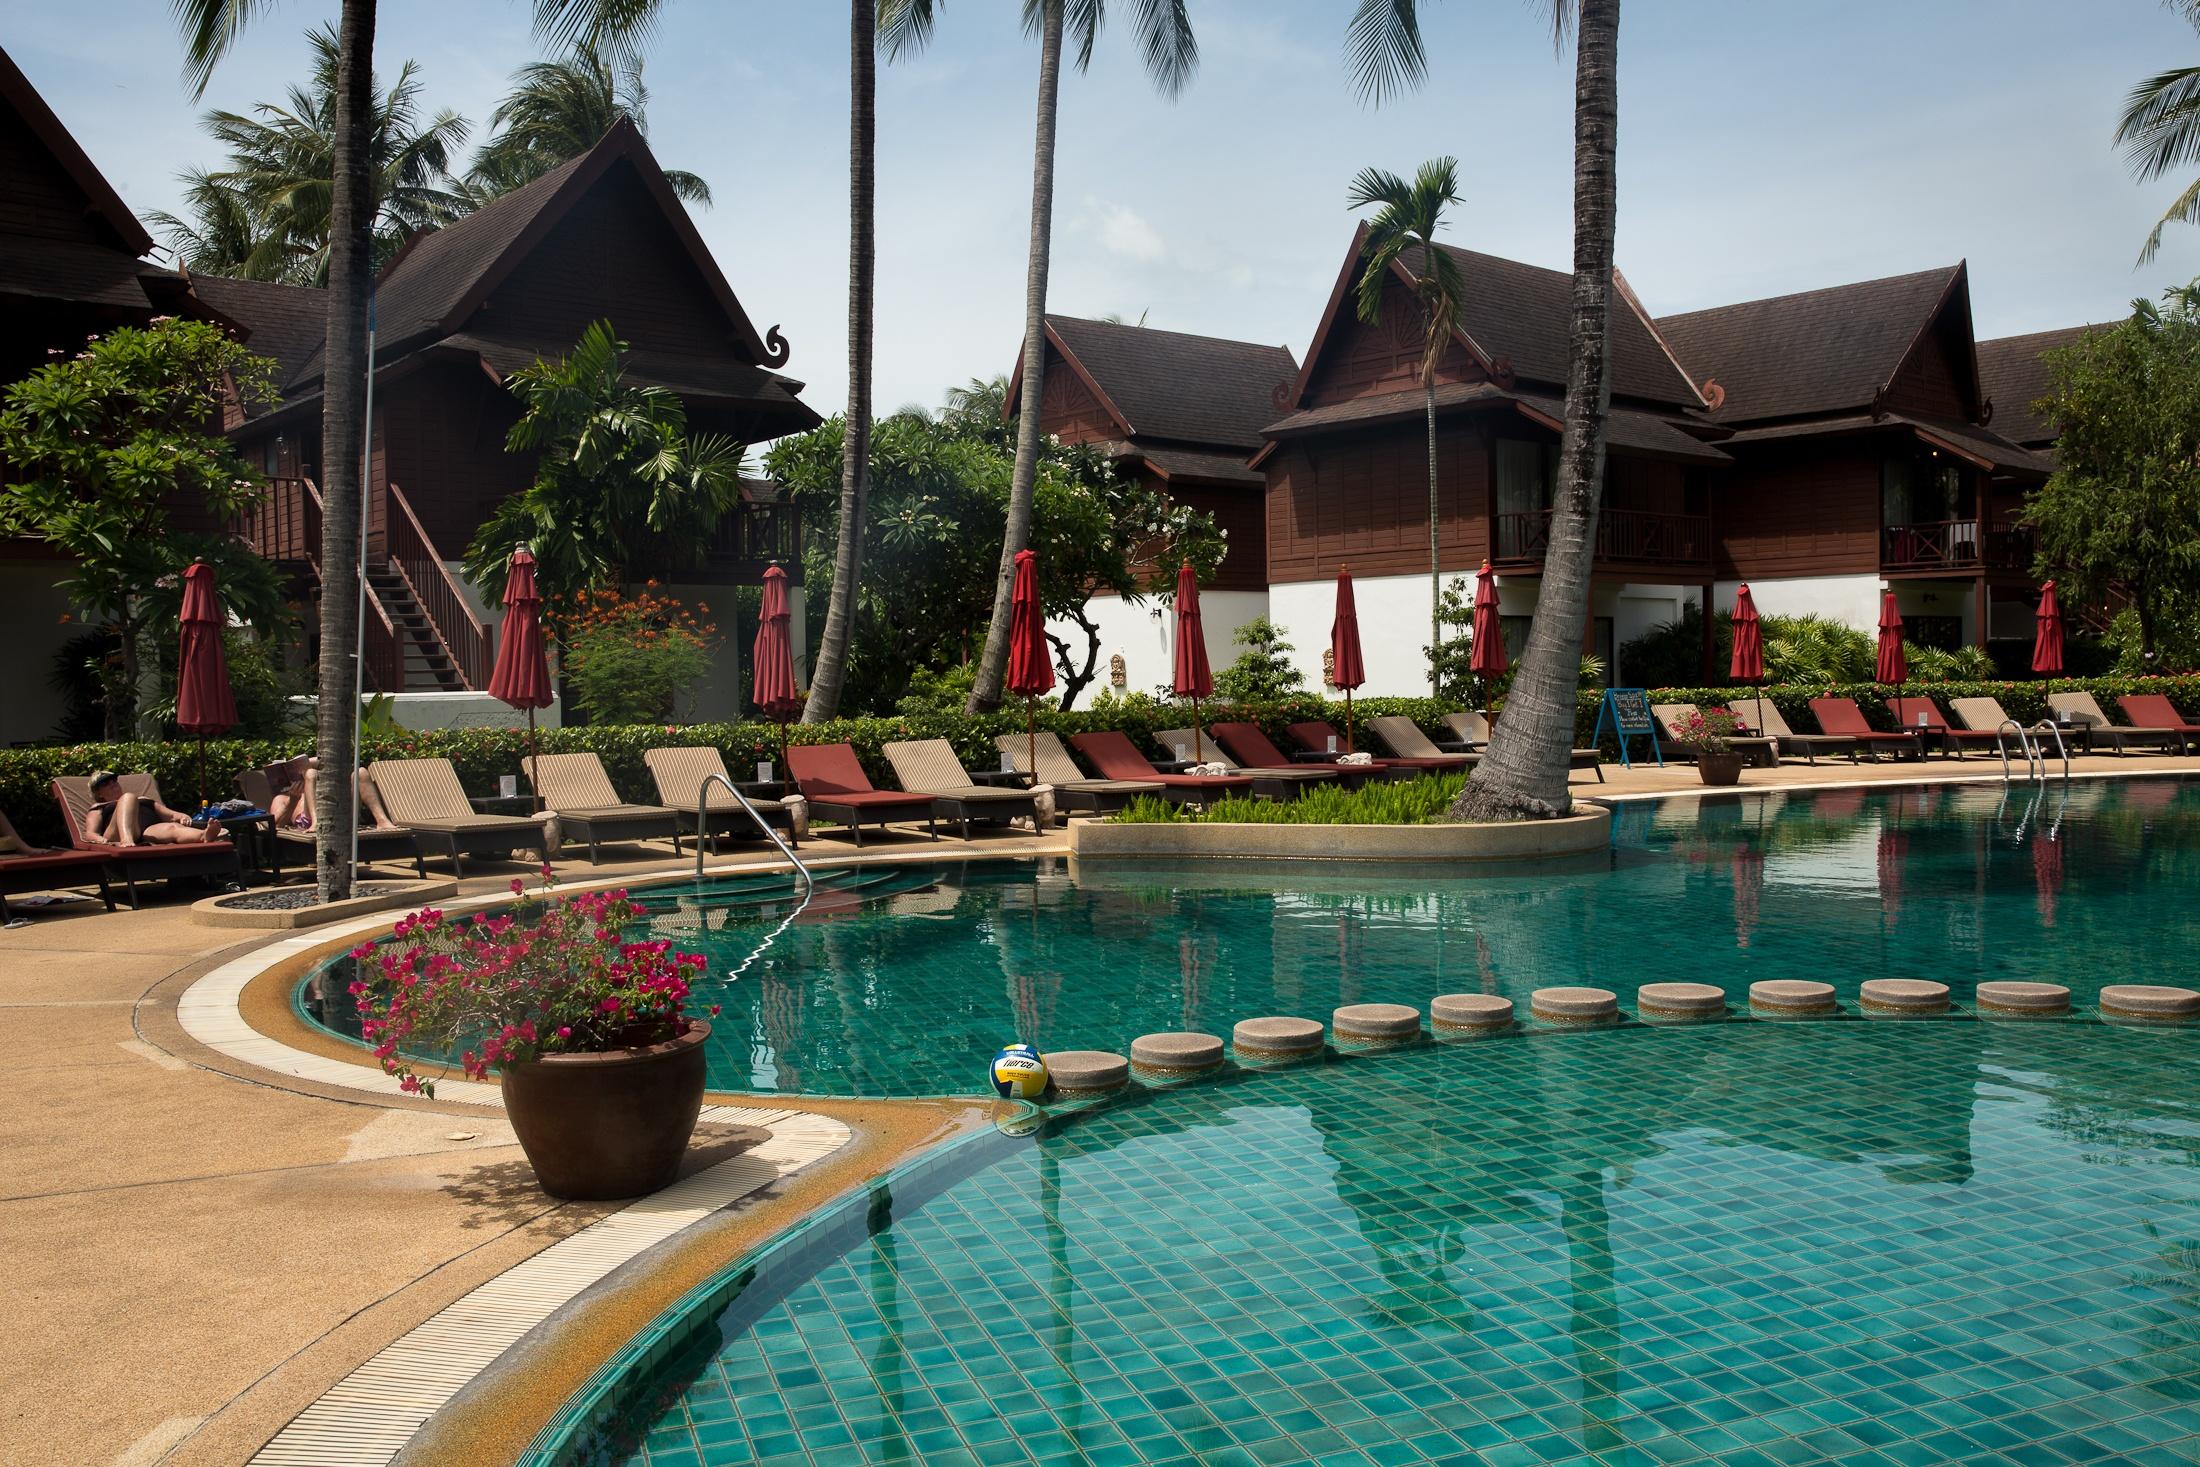 thailand koh samui chaweng beach island paradise vacation travel blog hut hotel pool paradise shershegoes.com